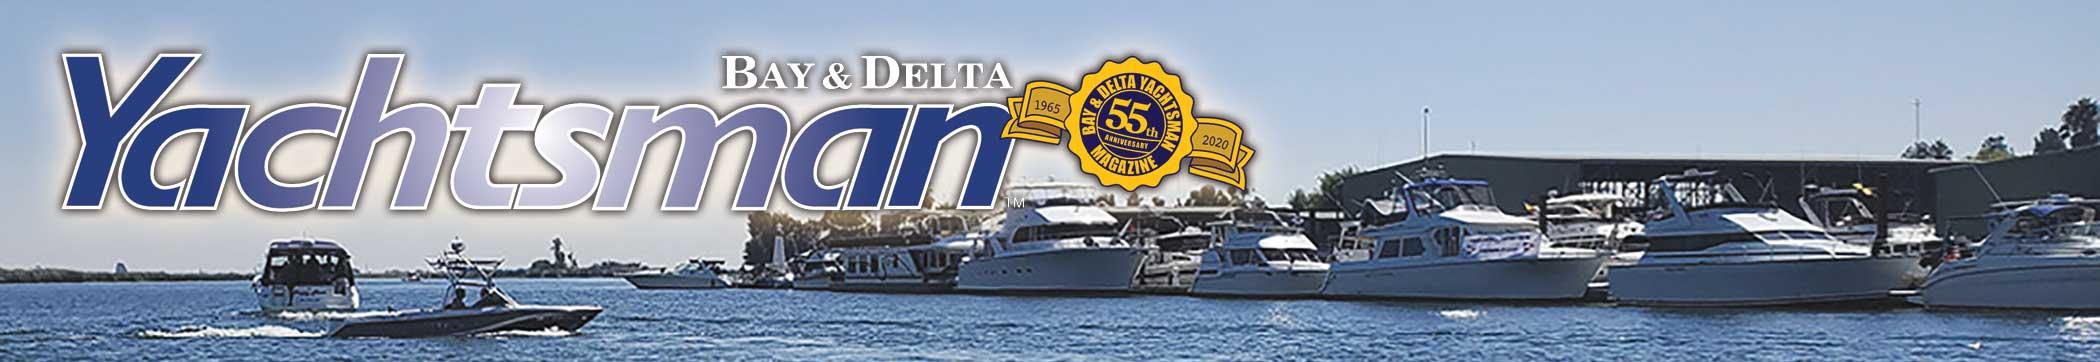 Bay and Delta Yachtsman